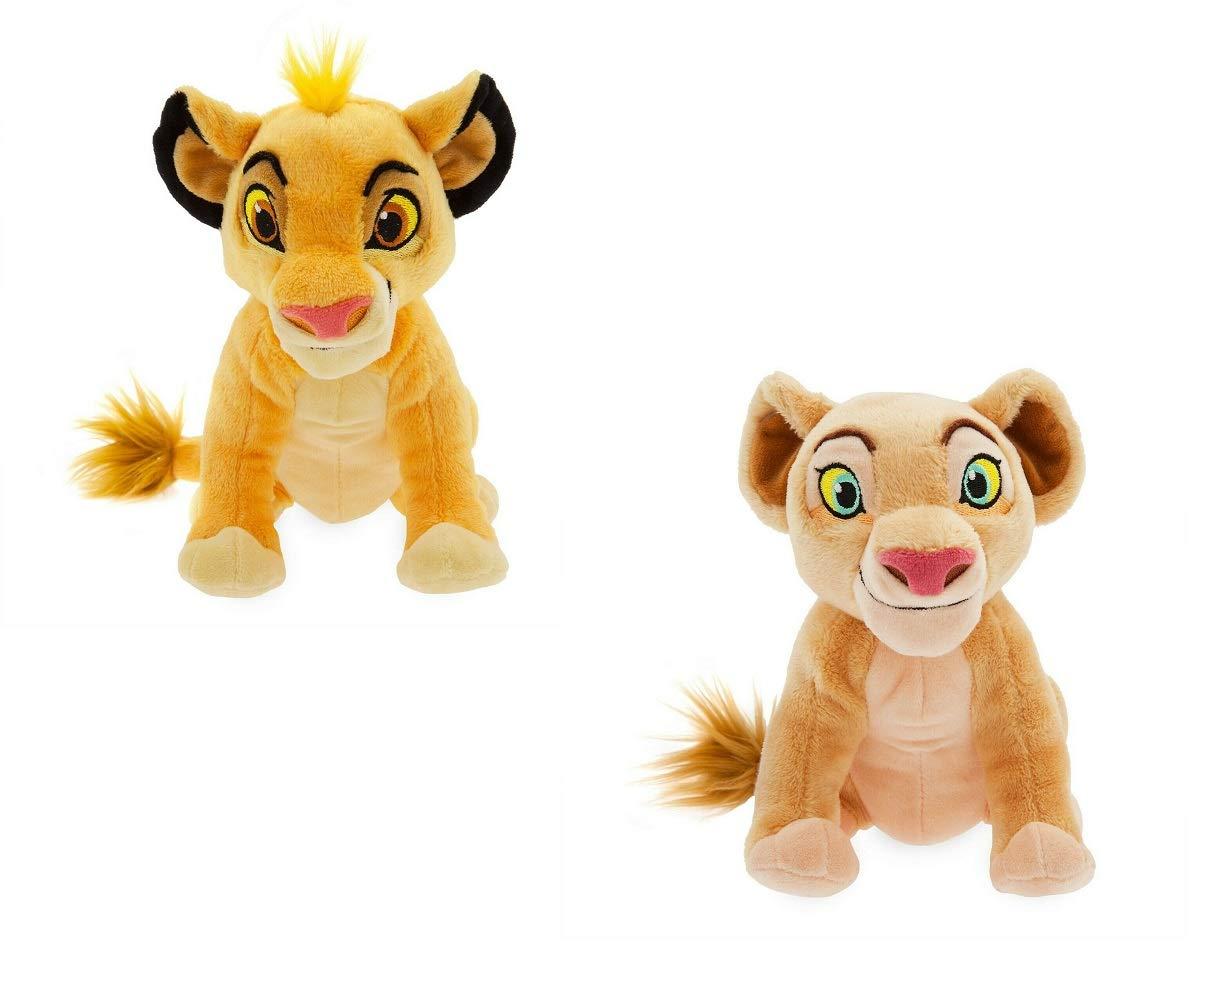 NOUVEAU DISNEY THE LION KING 15 cm NALA Soft Plush Toy